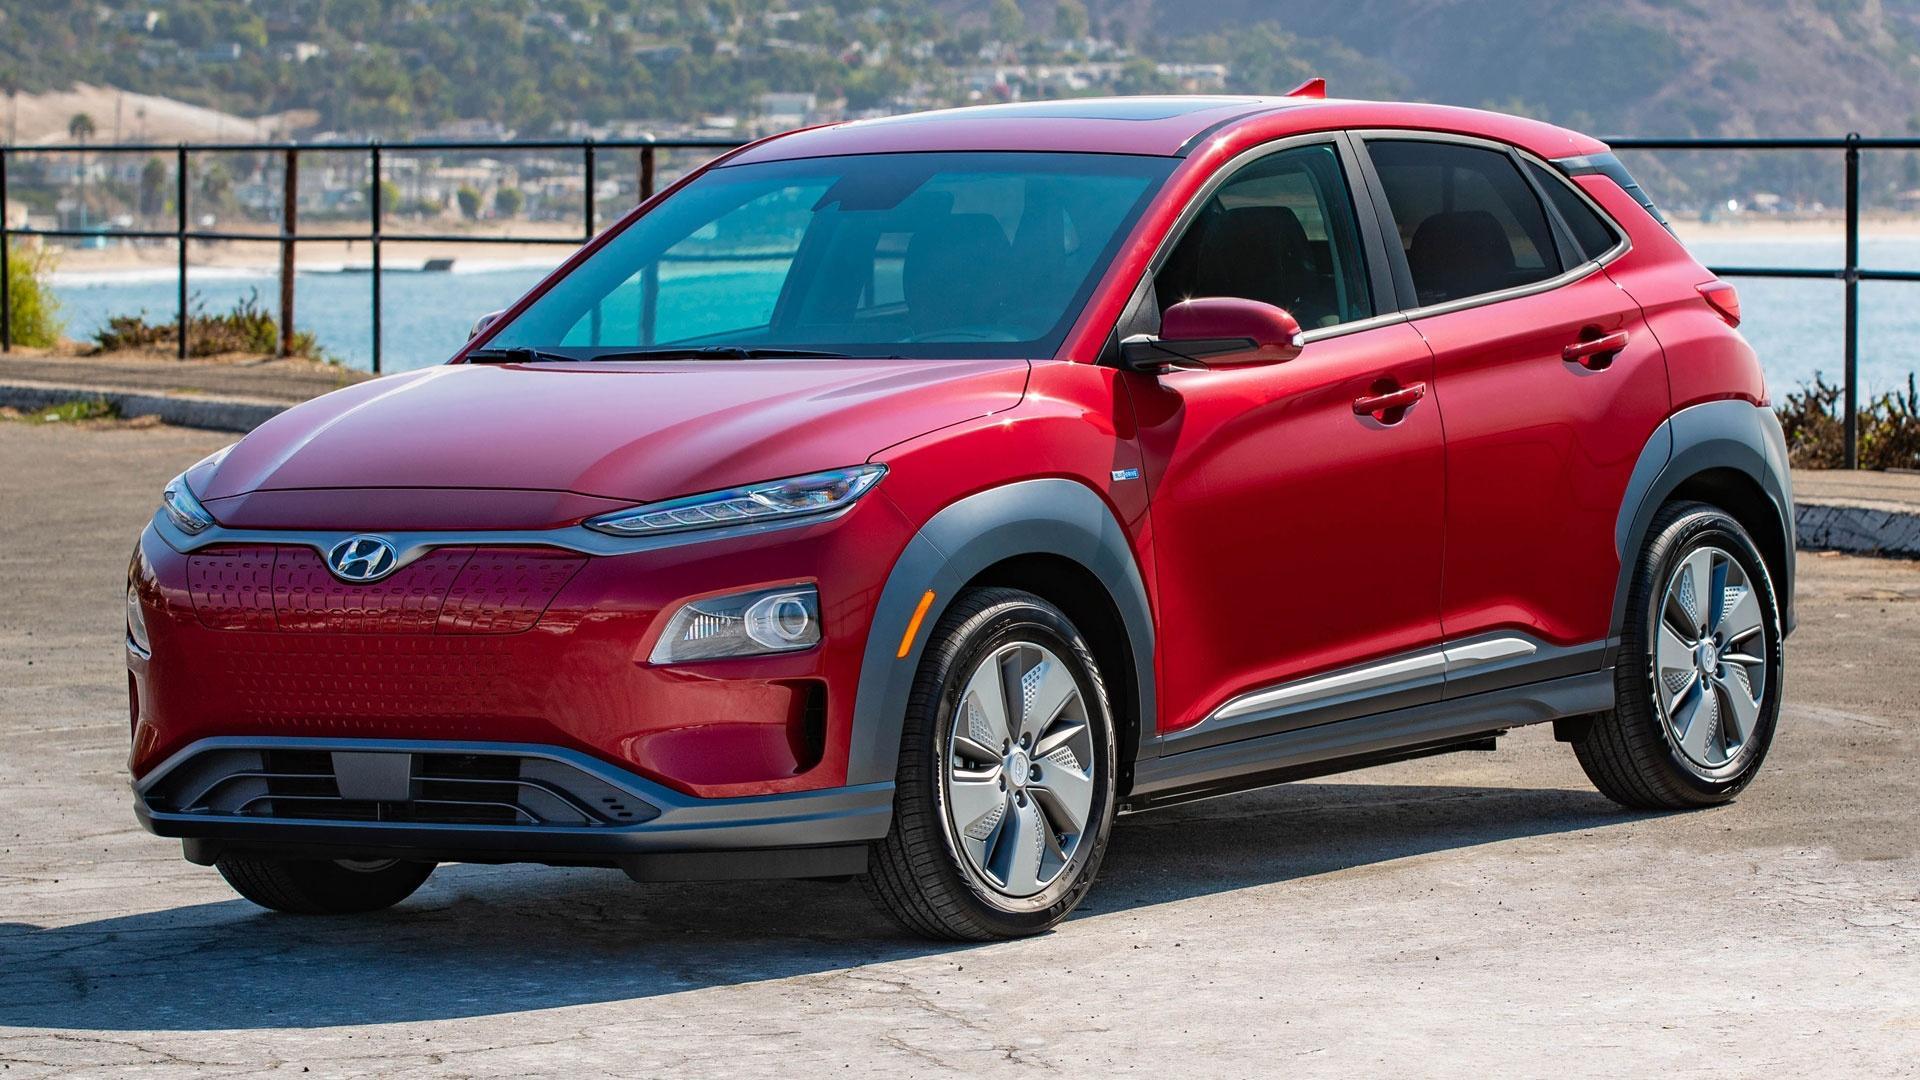 2019 Hyundai Kona Electric & 2019 Honda Passport